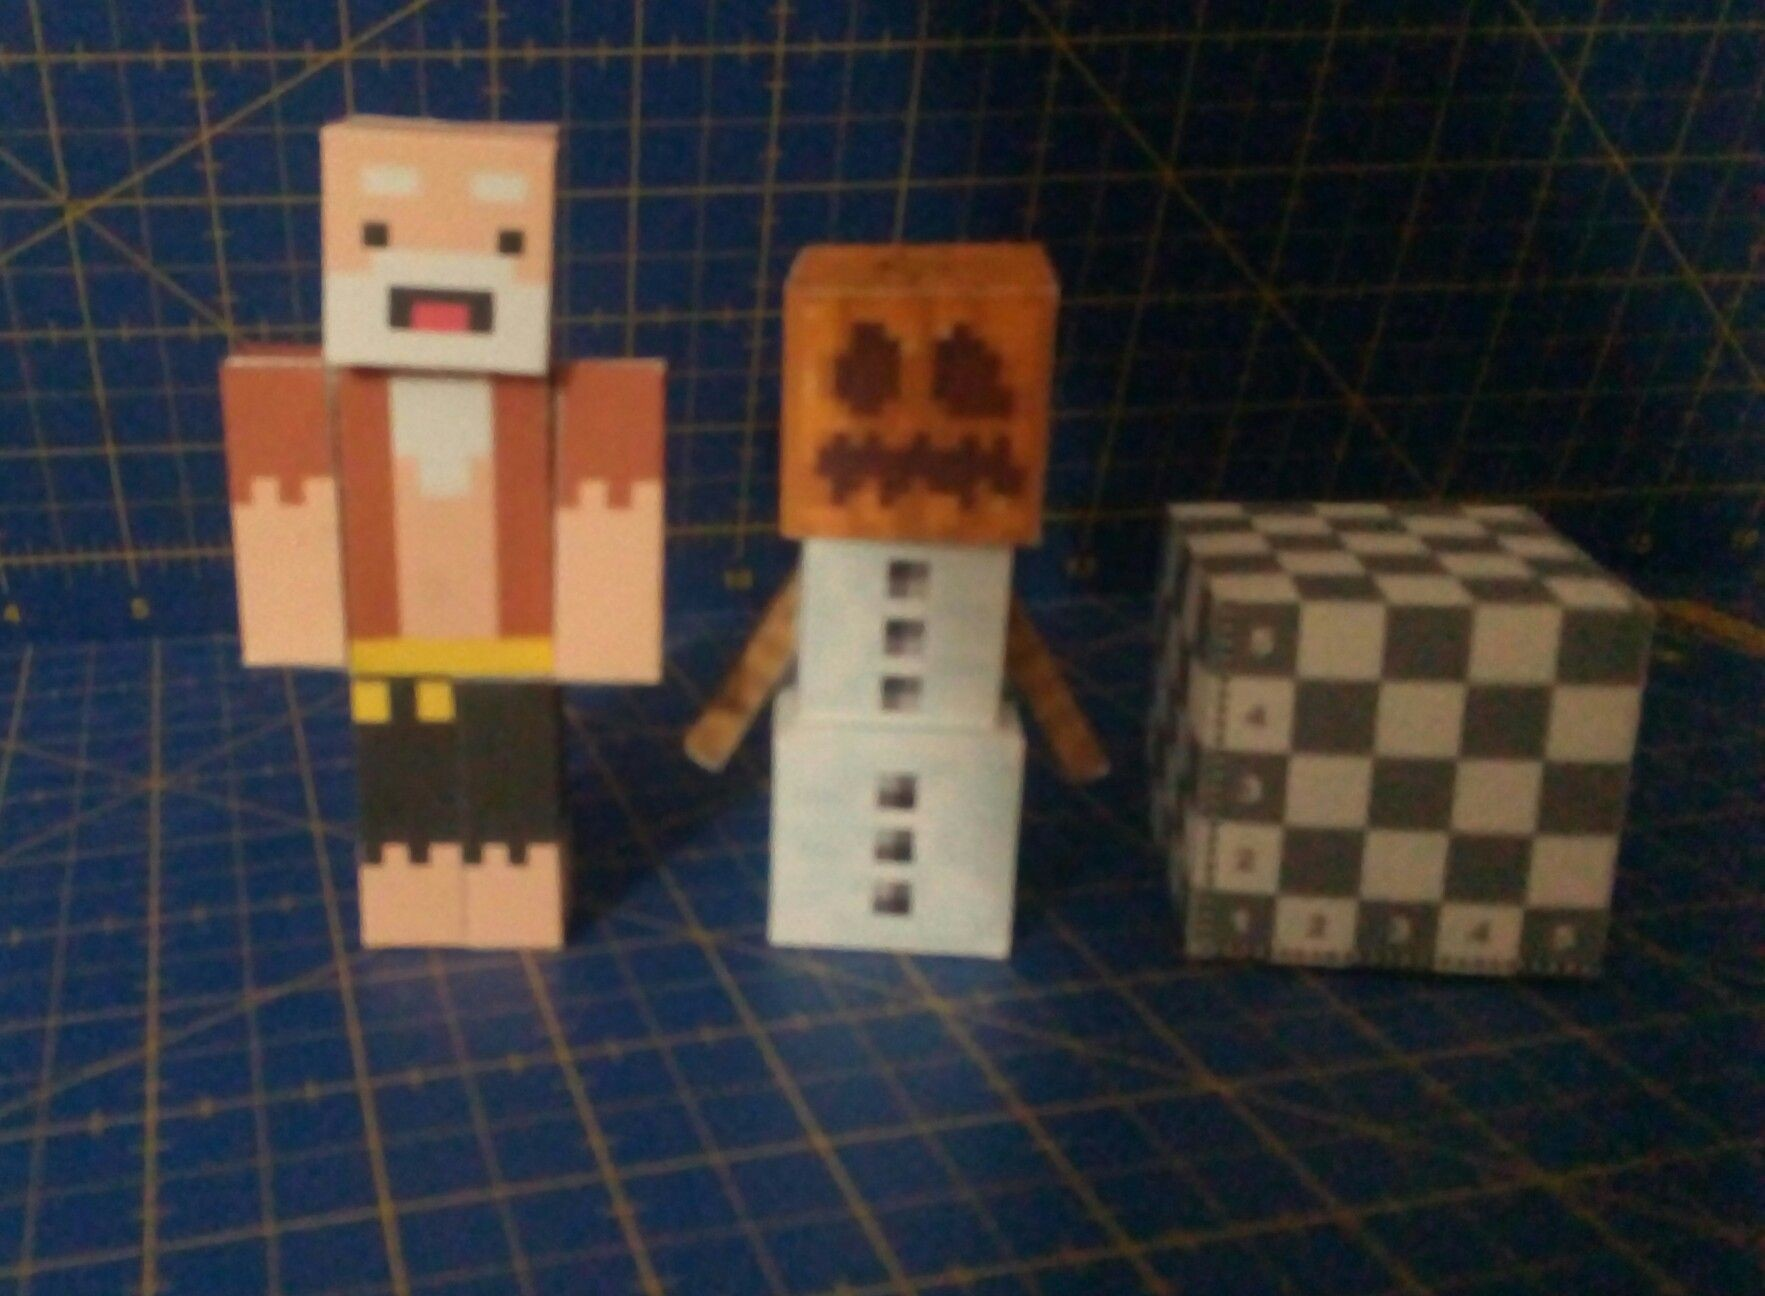 Minecraft Deluxe Papercraft Pacheco Cara Floja Y yeti Papercraft